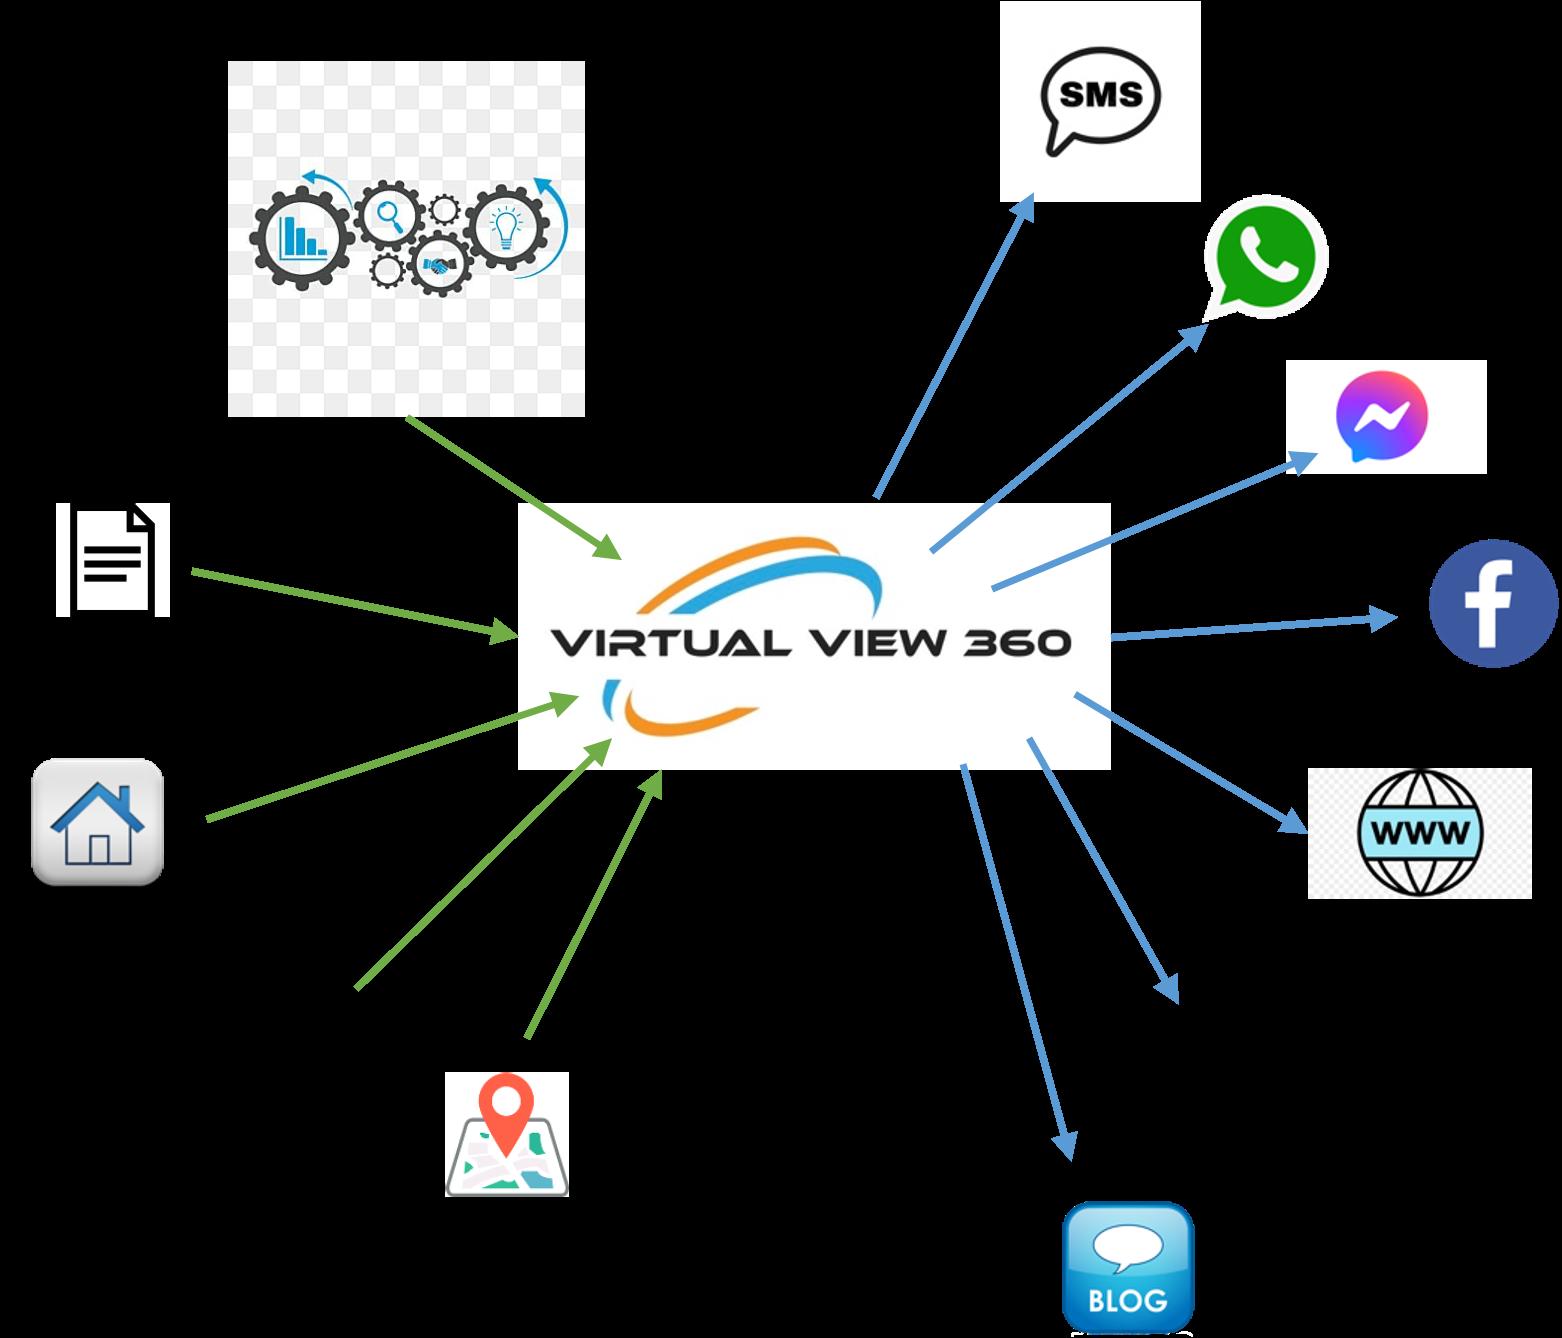 VWSocial Virtual View 360